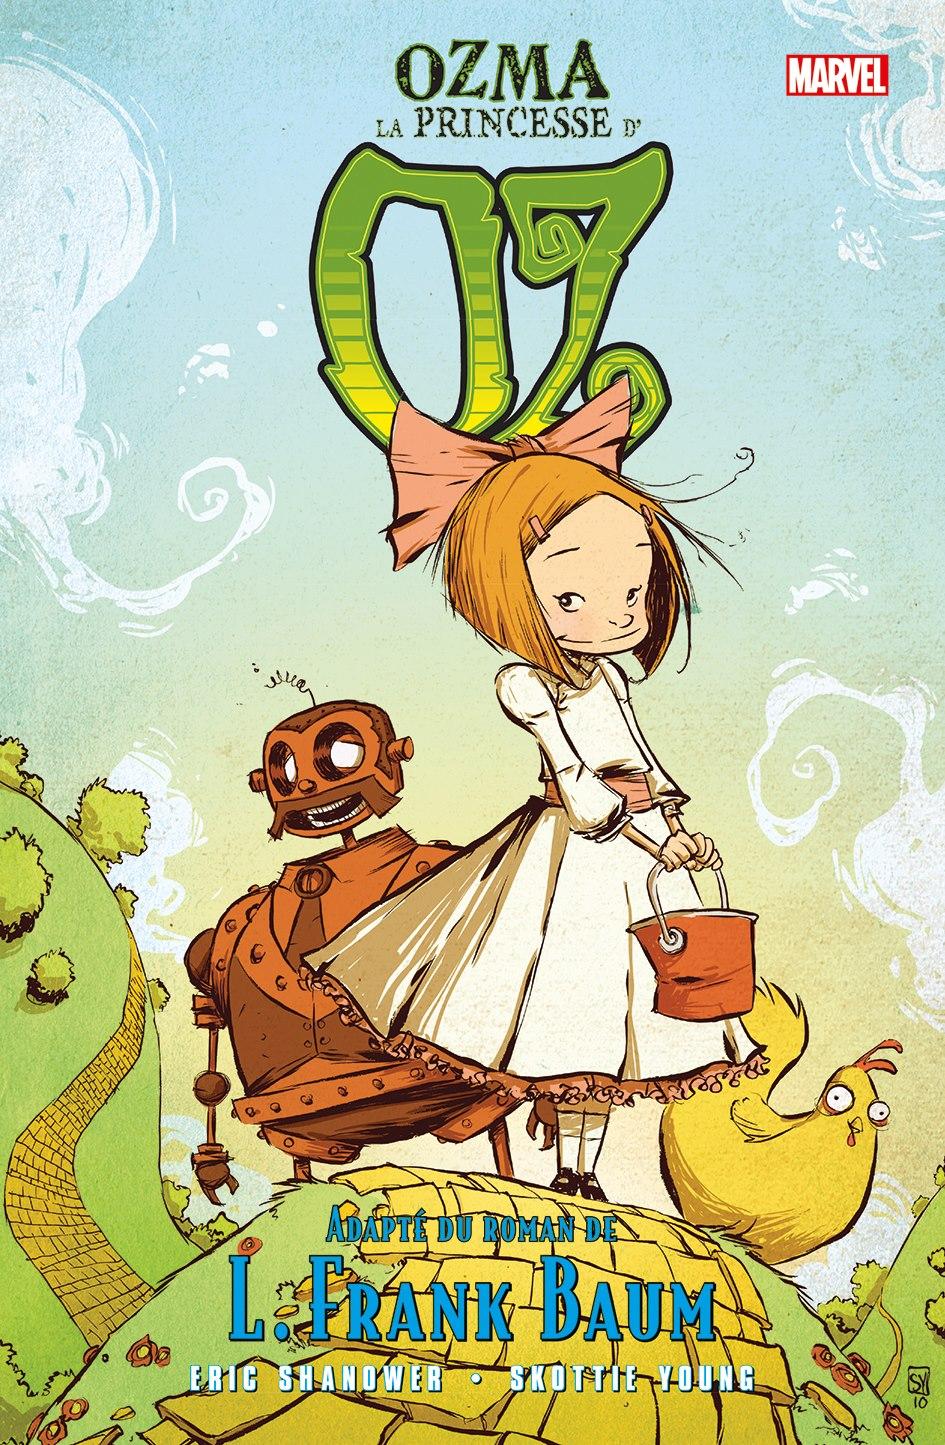 img_comics_5525_ozma-la-princesse-d-oz